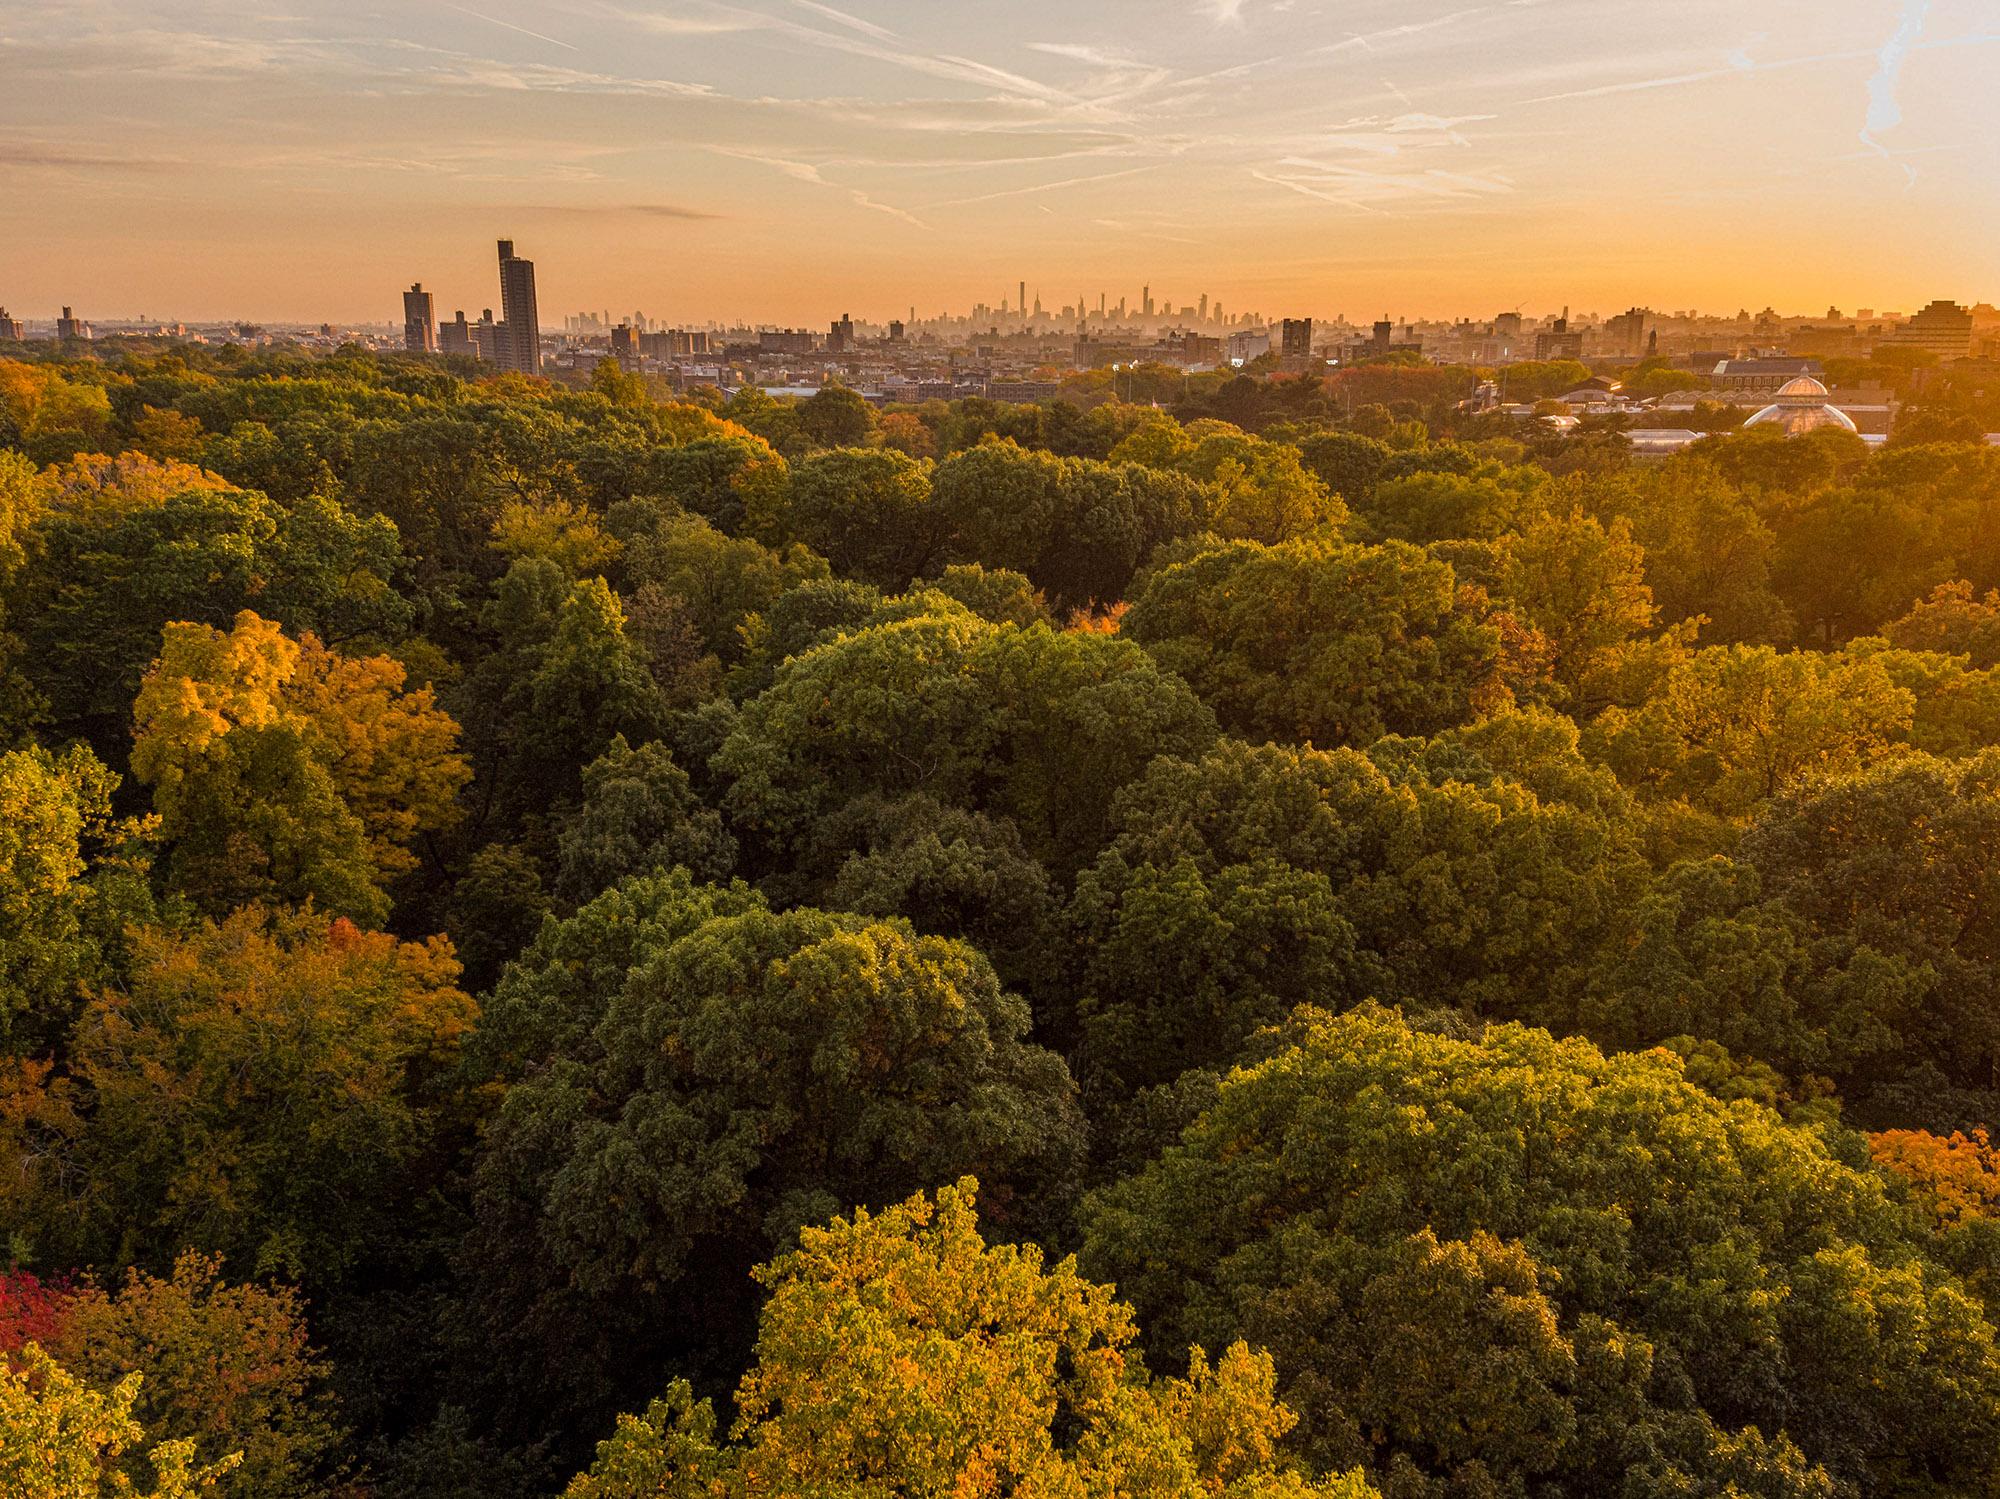 The Golden Bronx